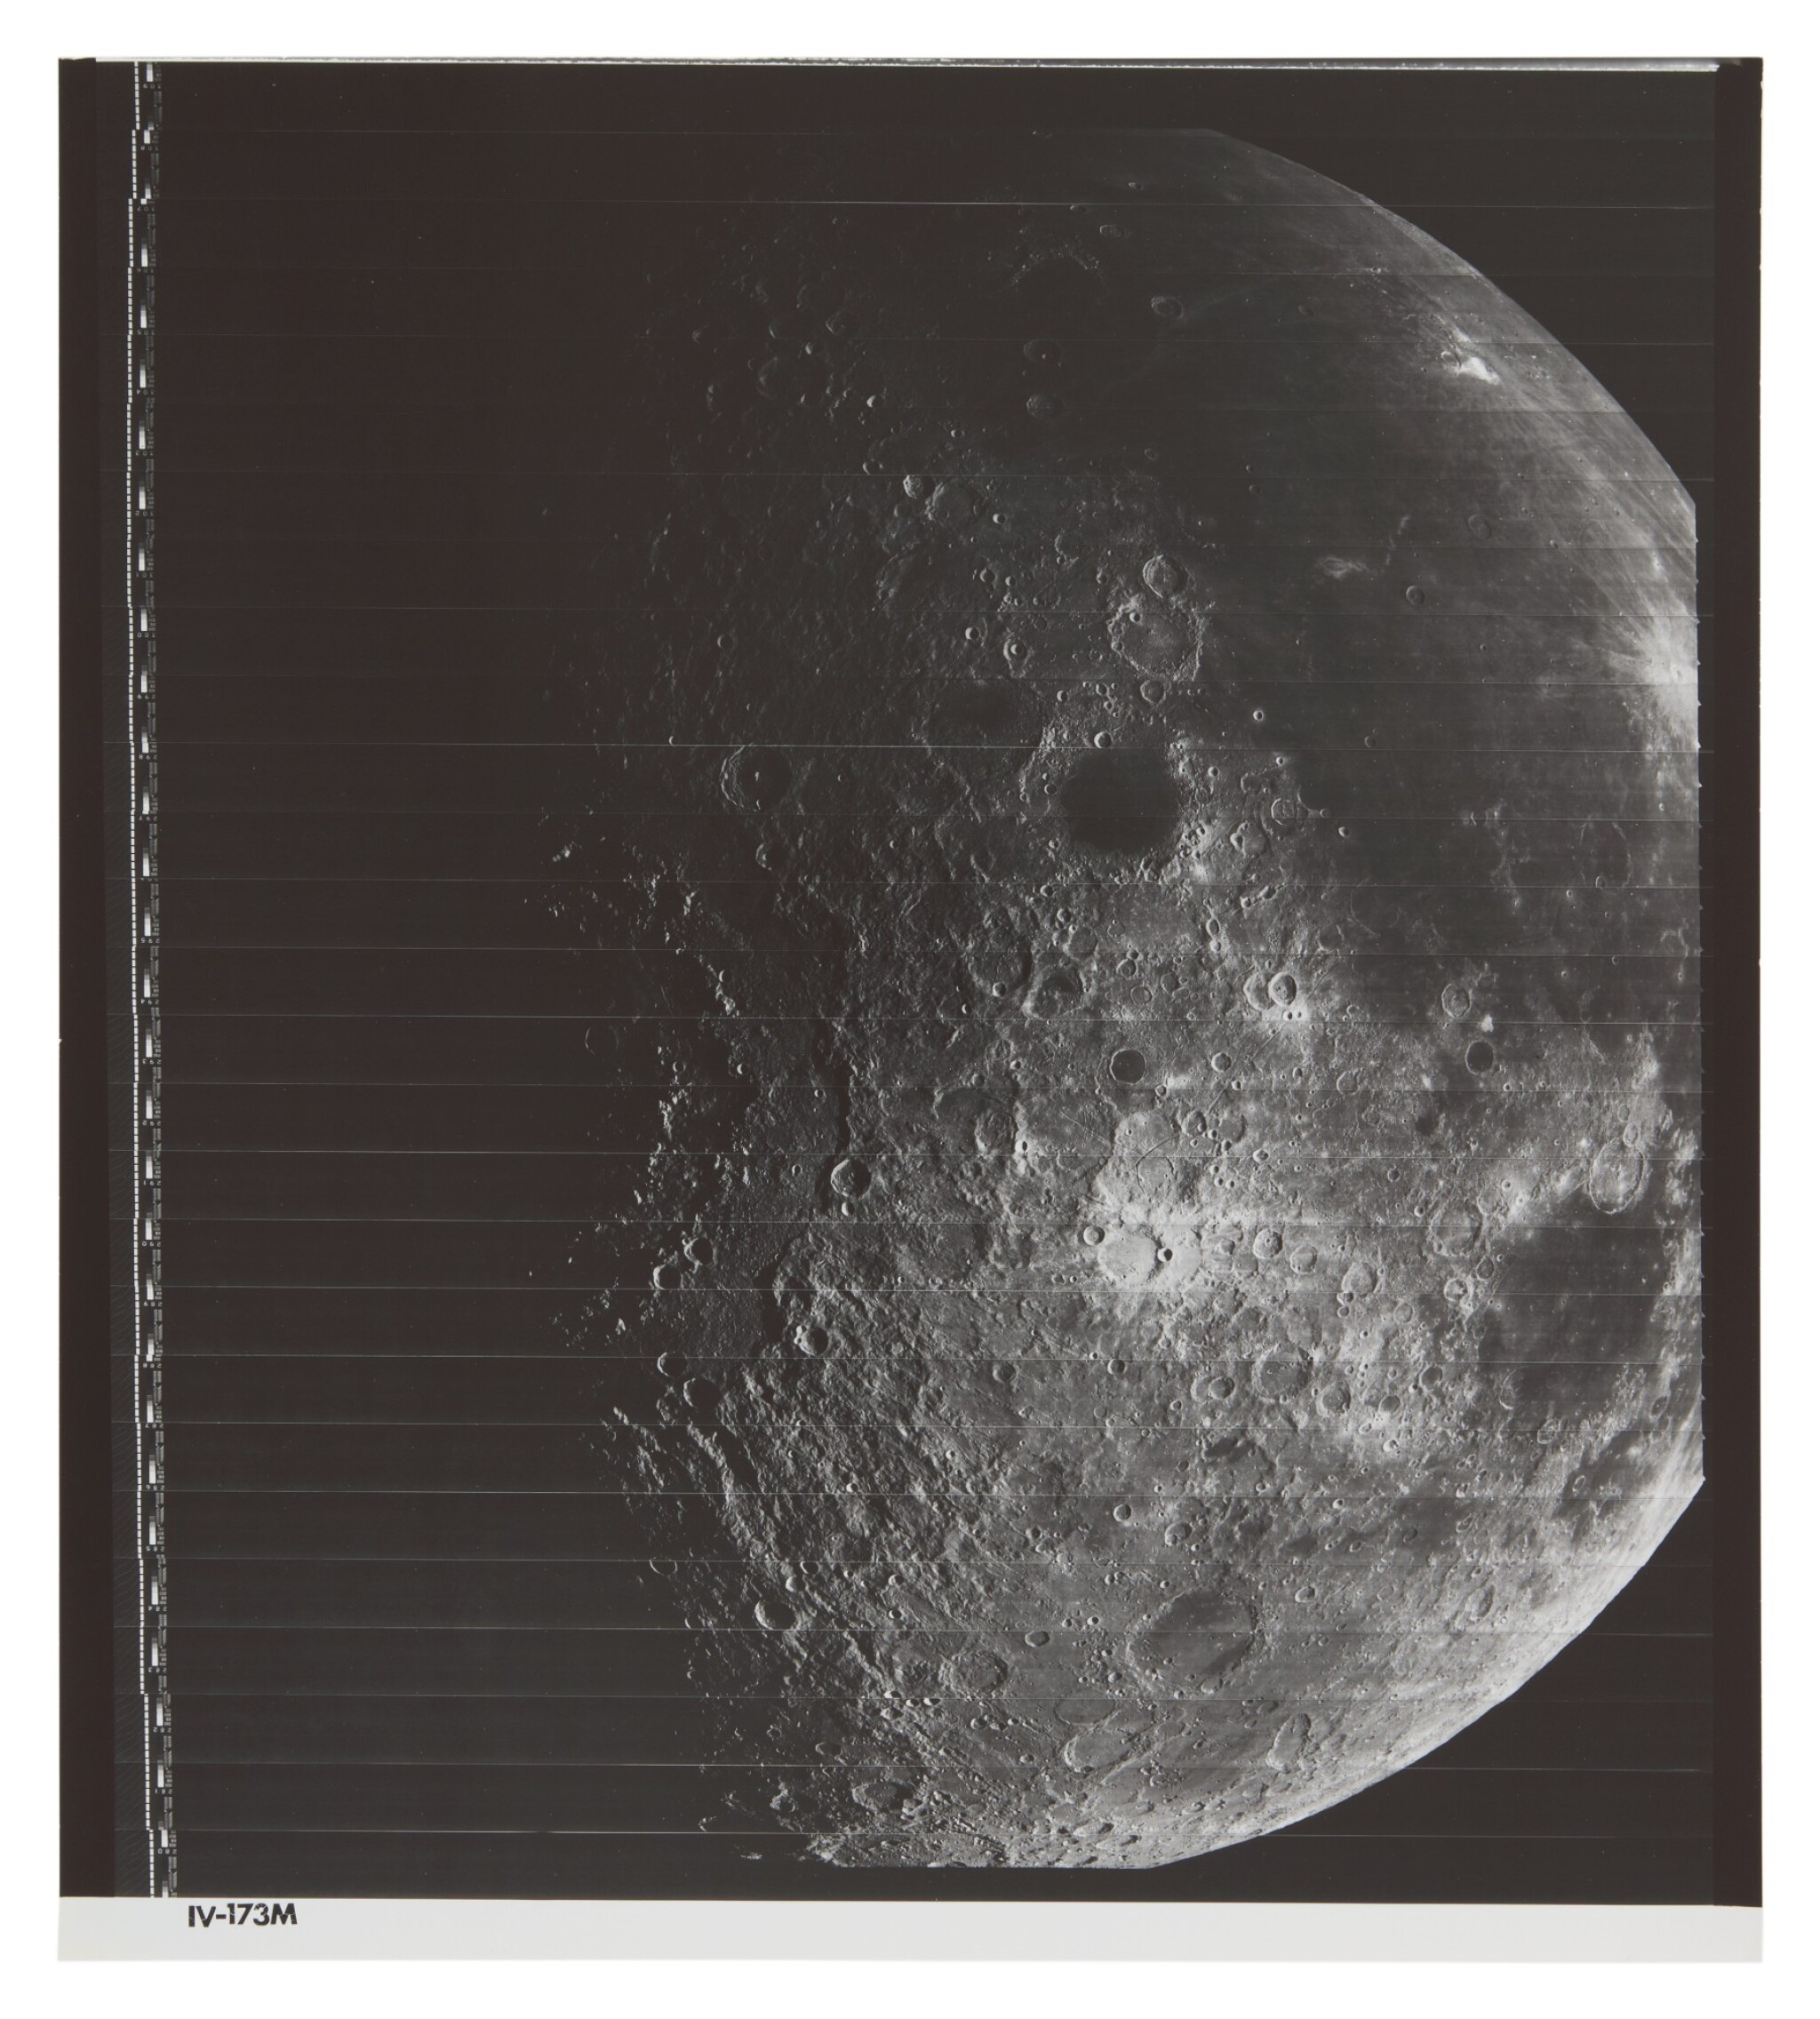 LUNAR ORBITER IV. NEARSIDE OF THE MOON, WITH MARE ORIENTALE, GRAMALDI CRATER, AND OCEANUS PROCELLARUM, 1976